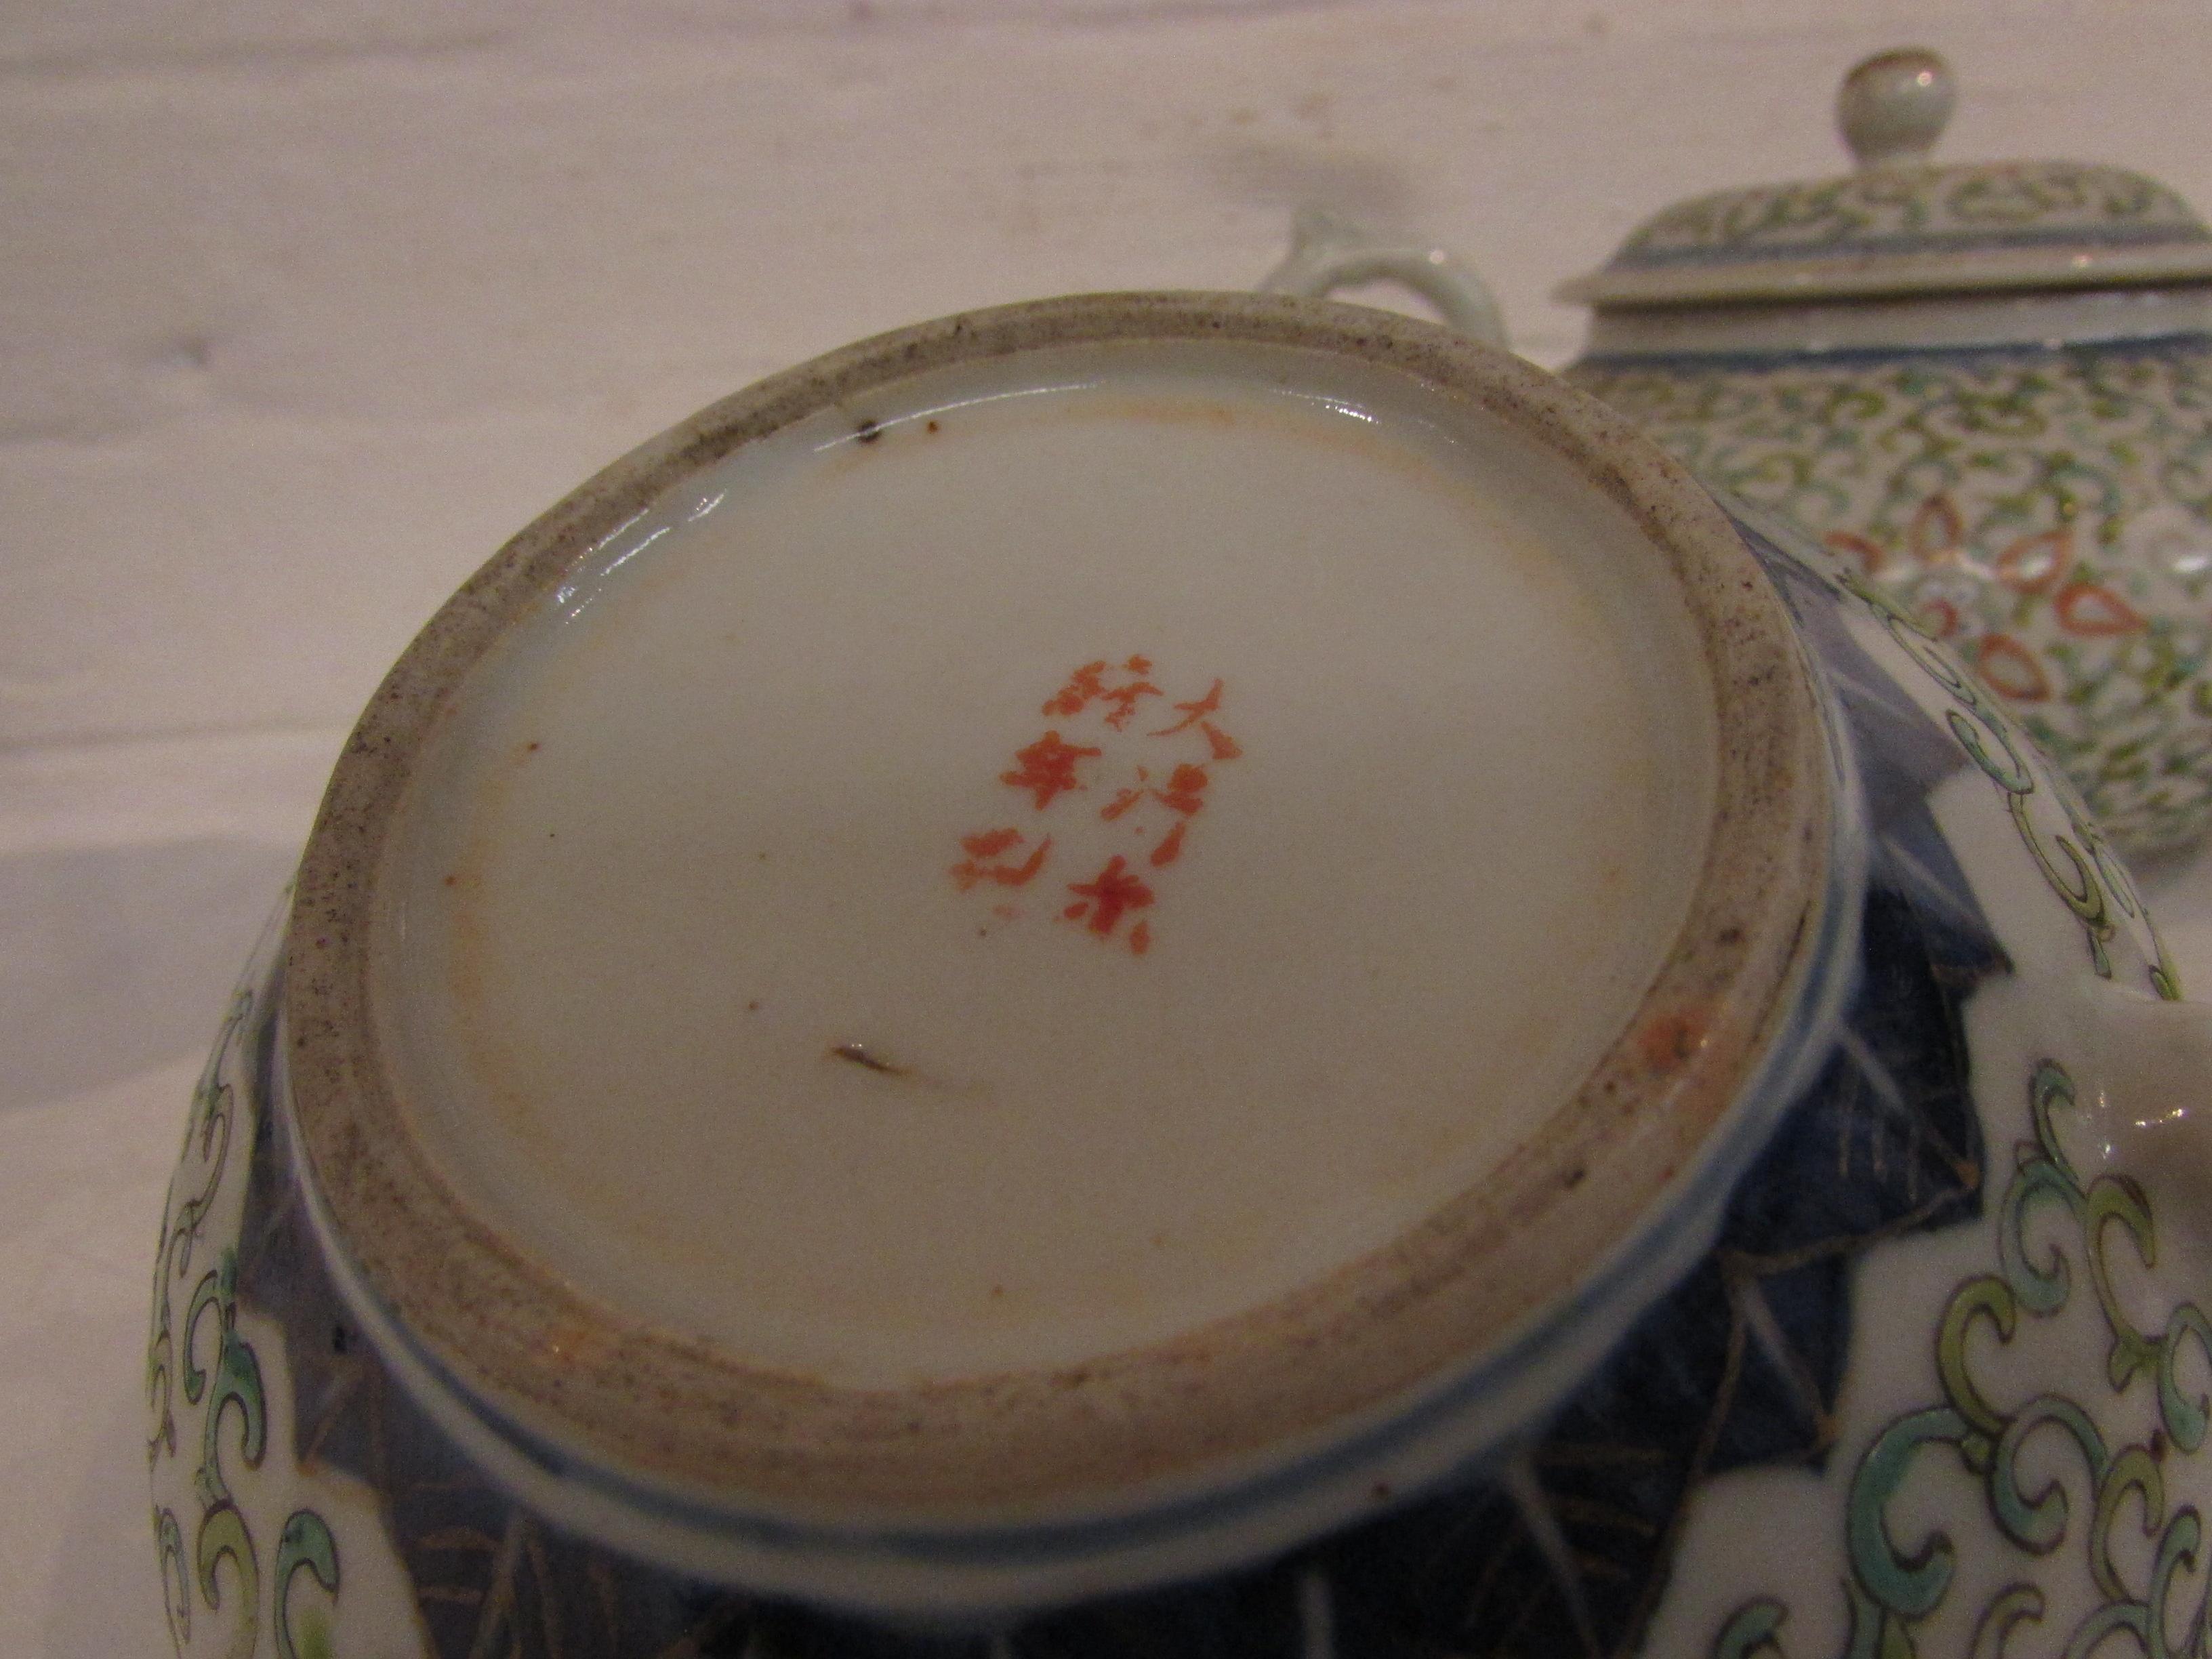 Lot 2 - Chinese three-part tea set comprising teapot, lidded sugar bowl and milk jug, thick white